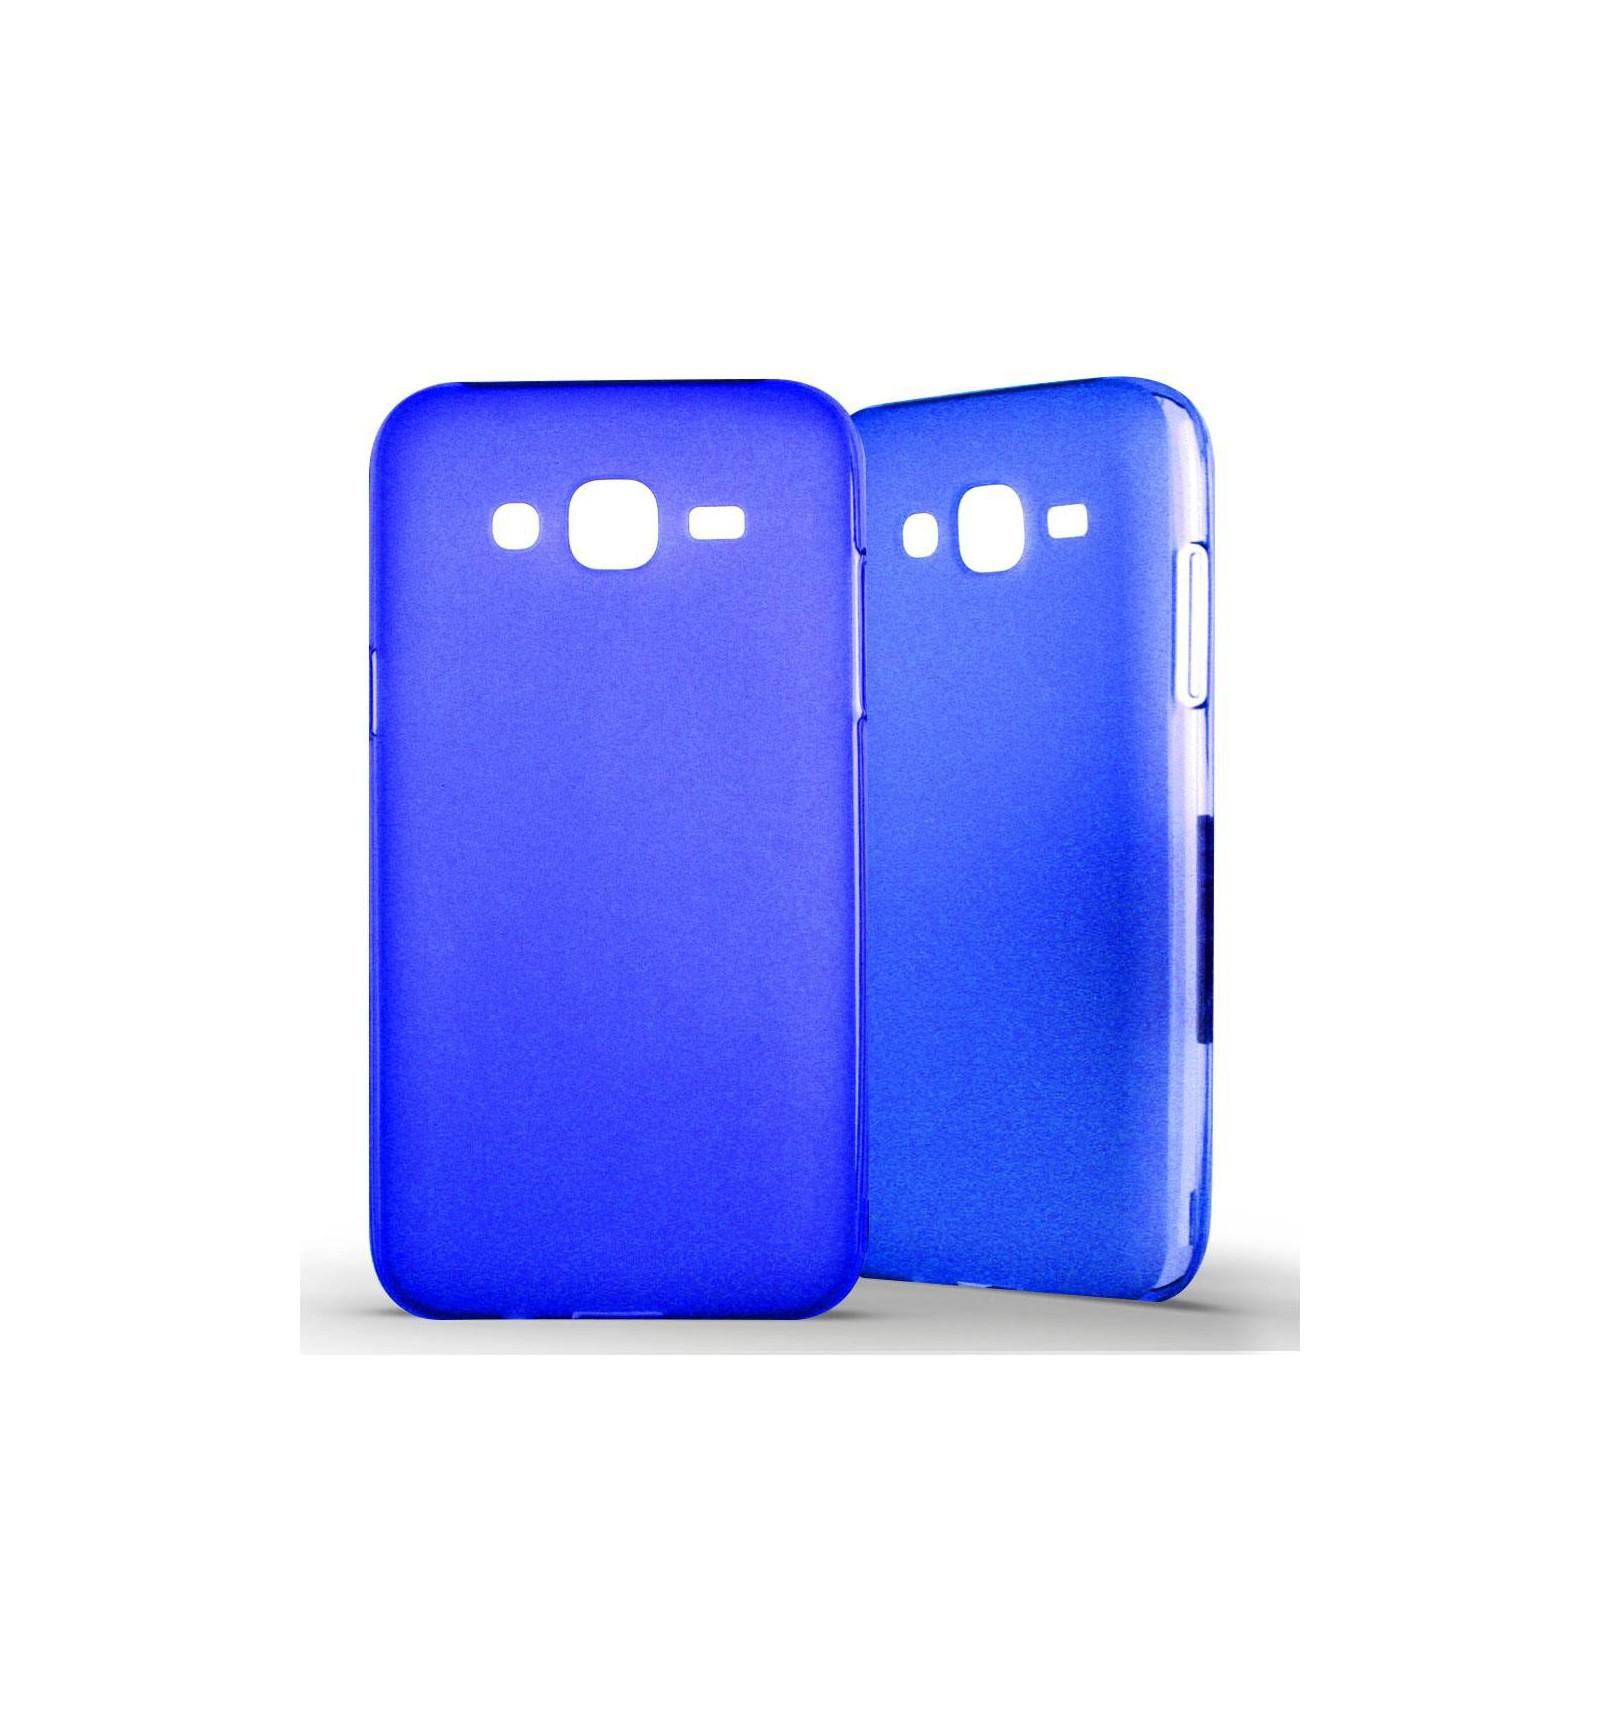 Coque Samsung Galaxy J5 Silicone Gel givré - Bleu Translucide